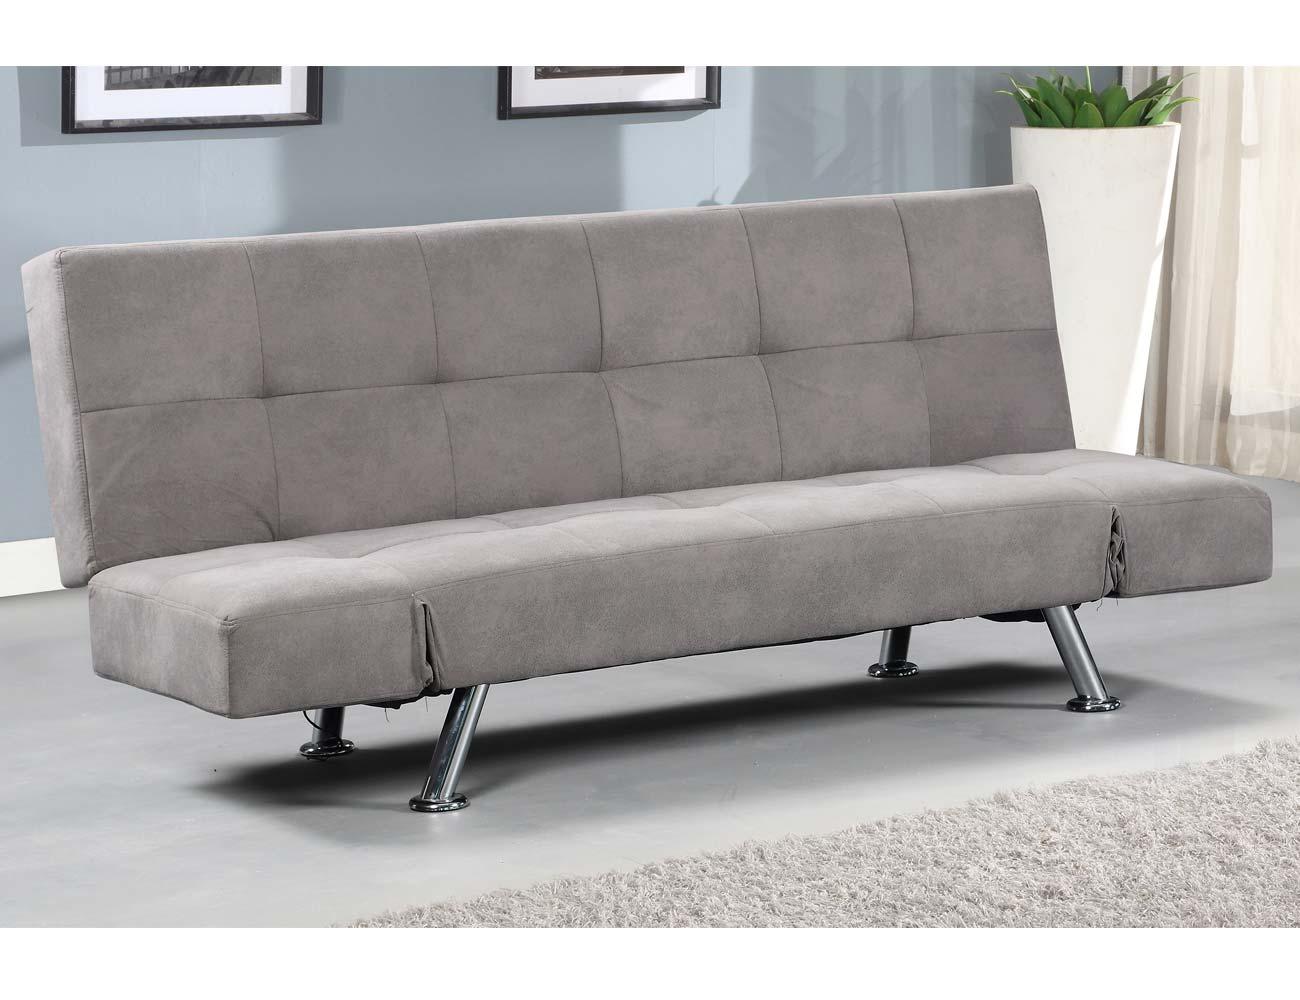 Sofa tapizado gris marengo clic clac bici